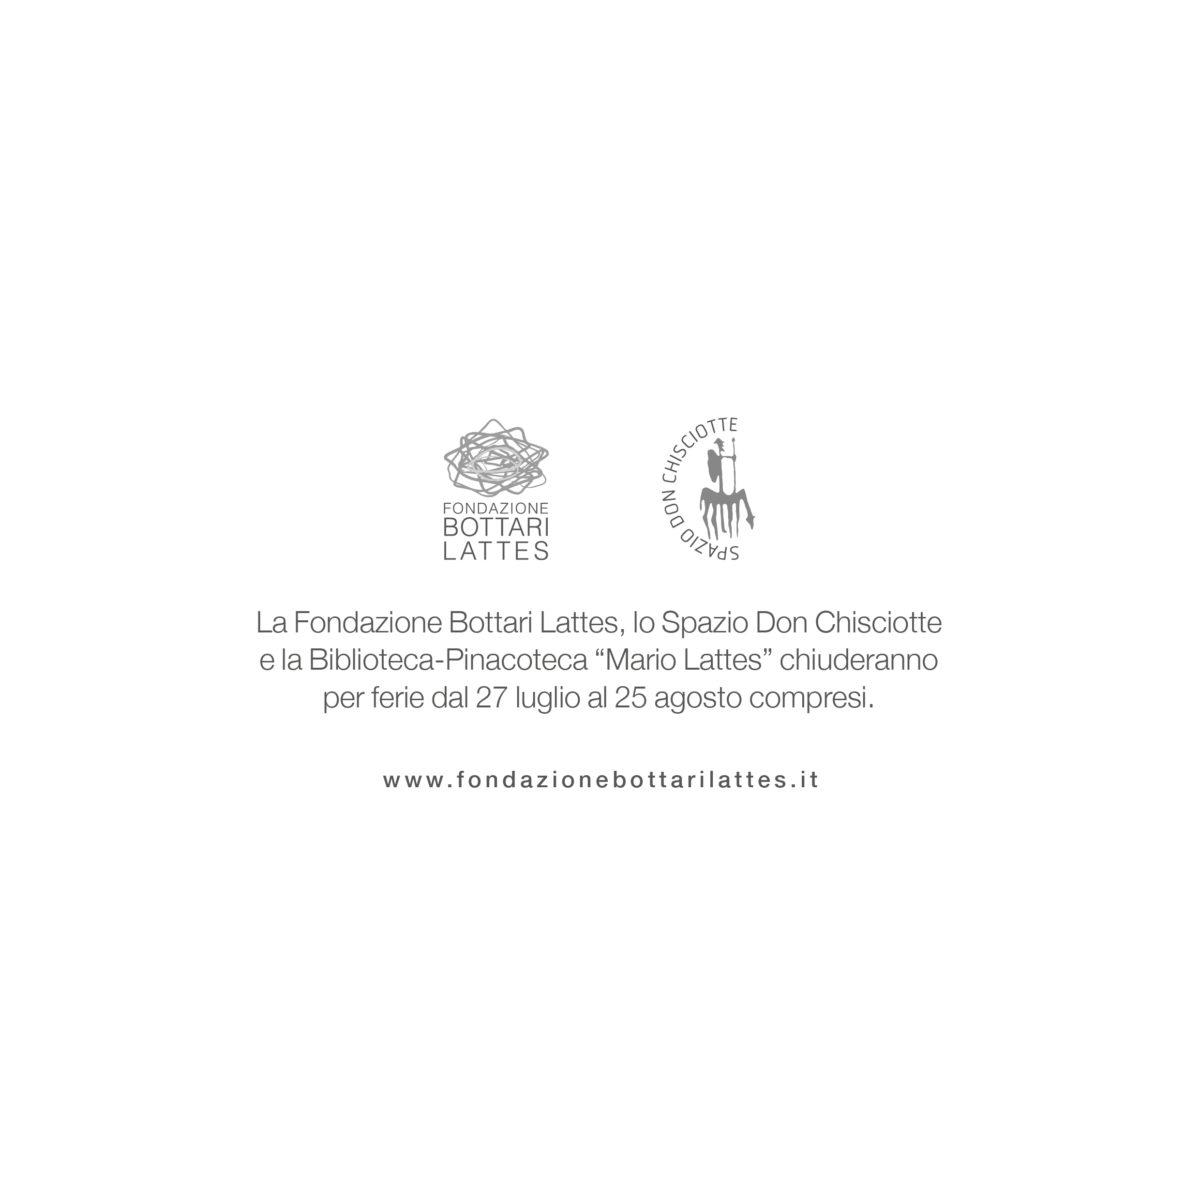 "Chiusura estiva Fondazione Bottari Lattes, Spazio Don Chisciotte, Biblioteca-Pinacoteca ""Mario Lattes"""